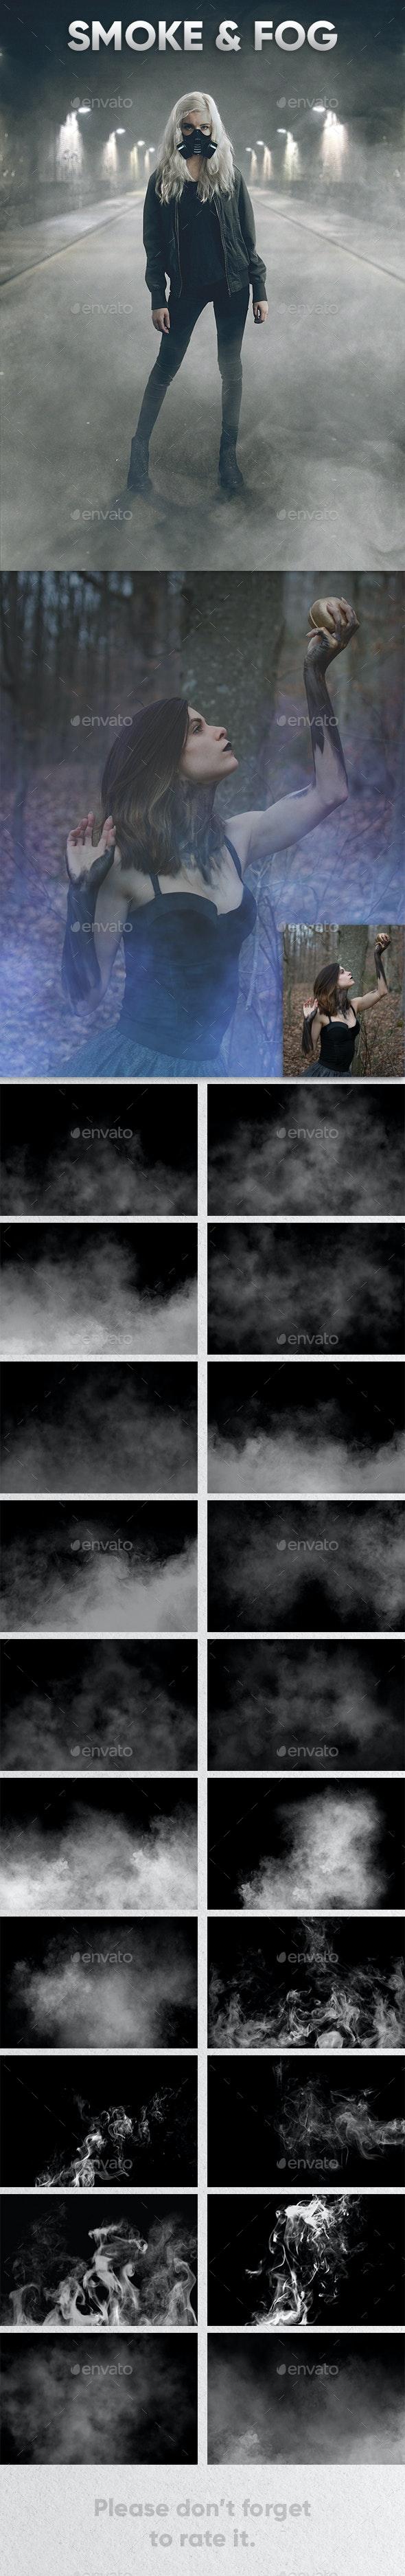 Smoke & Fog Overlays - Nature Photo Templates